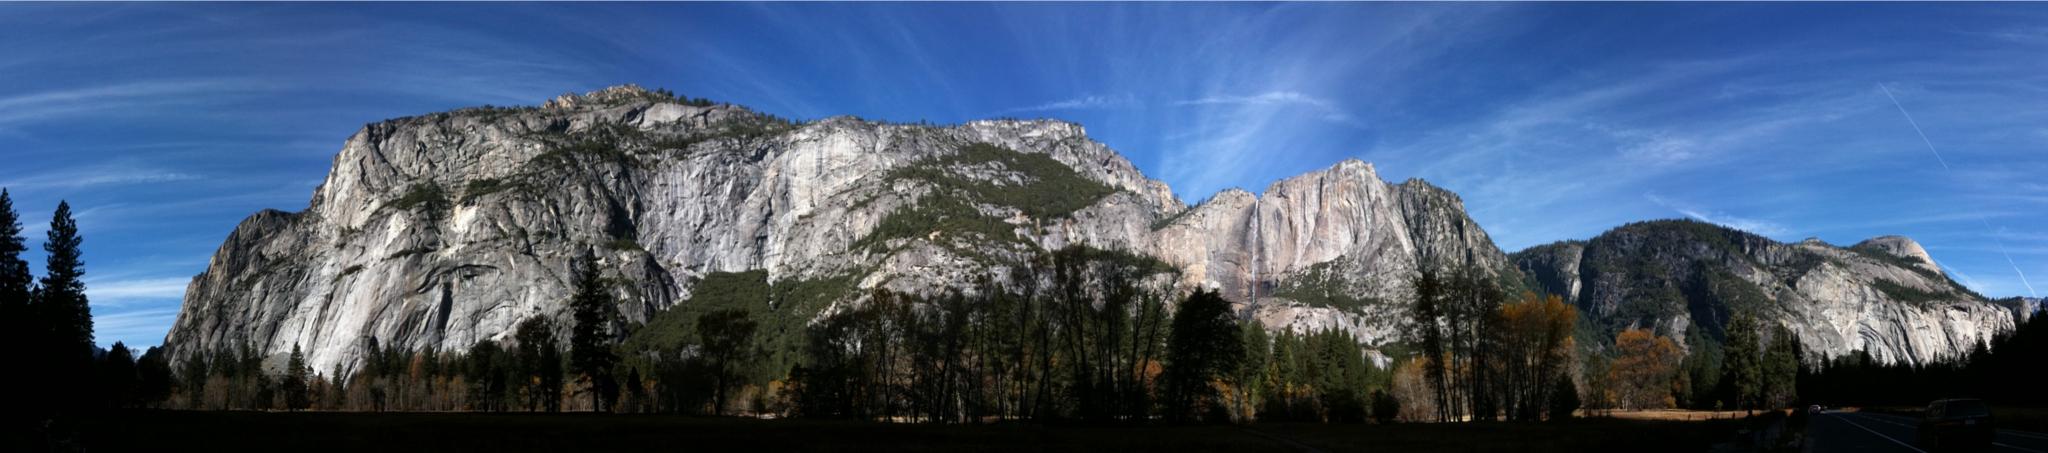 Yosemite / Scott Schiller